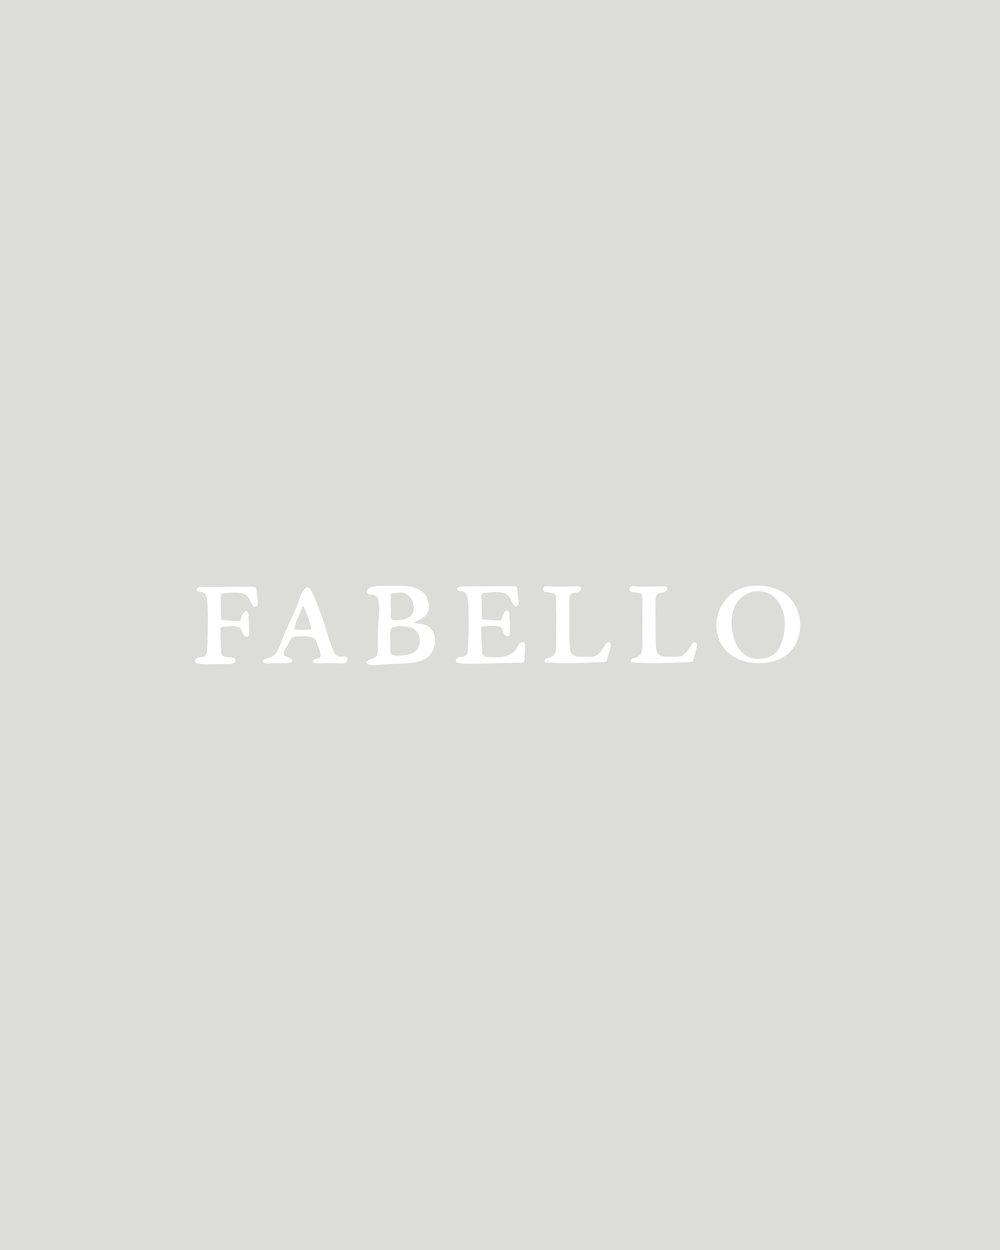 The Story Behind The Fabello Handmade Font | Britt Fabello | Sea of Atlas